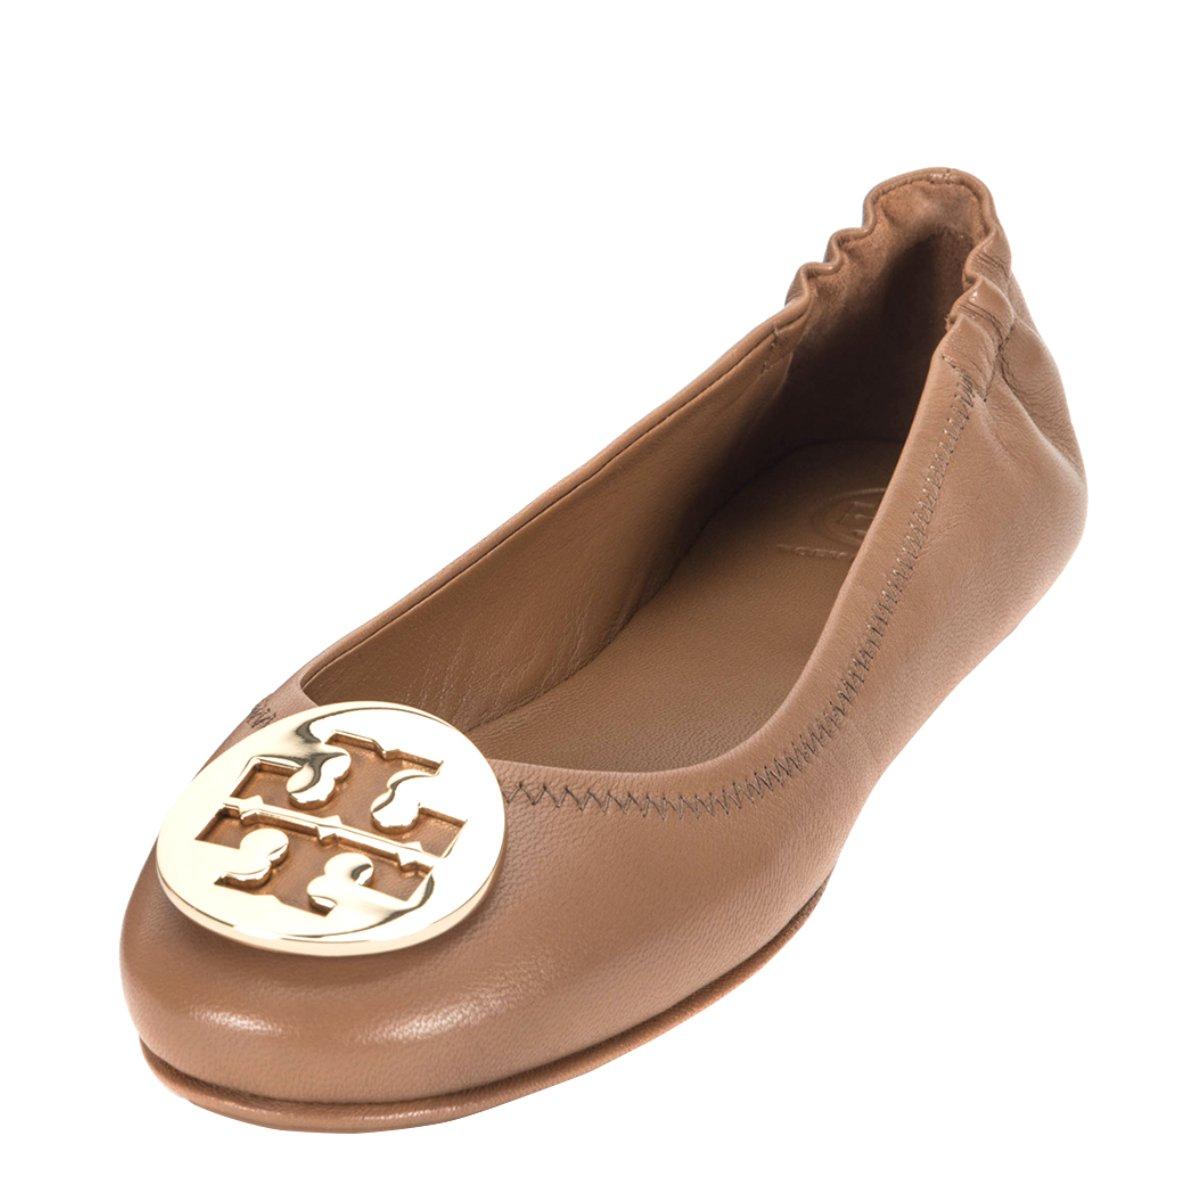 8bf26d4e20b4 Tory Burch Woman s Ballerina Tory Burch Minnie Travel In Nappa Cuoio  Amazon .ca  Shoes   Handbags